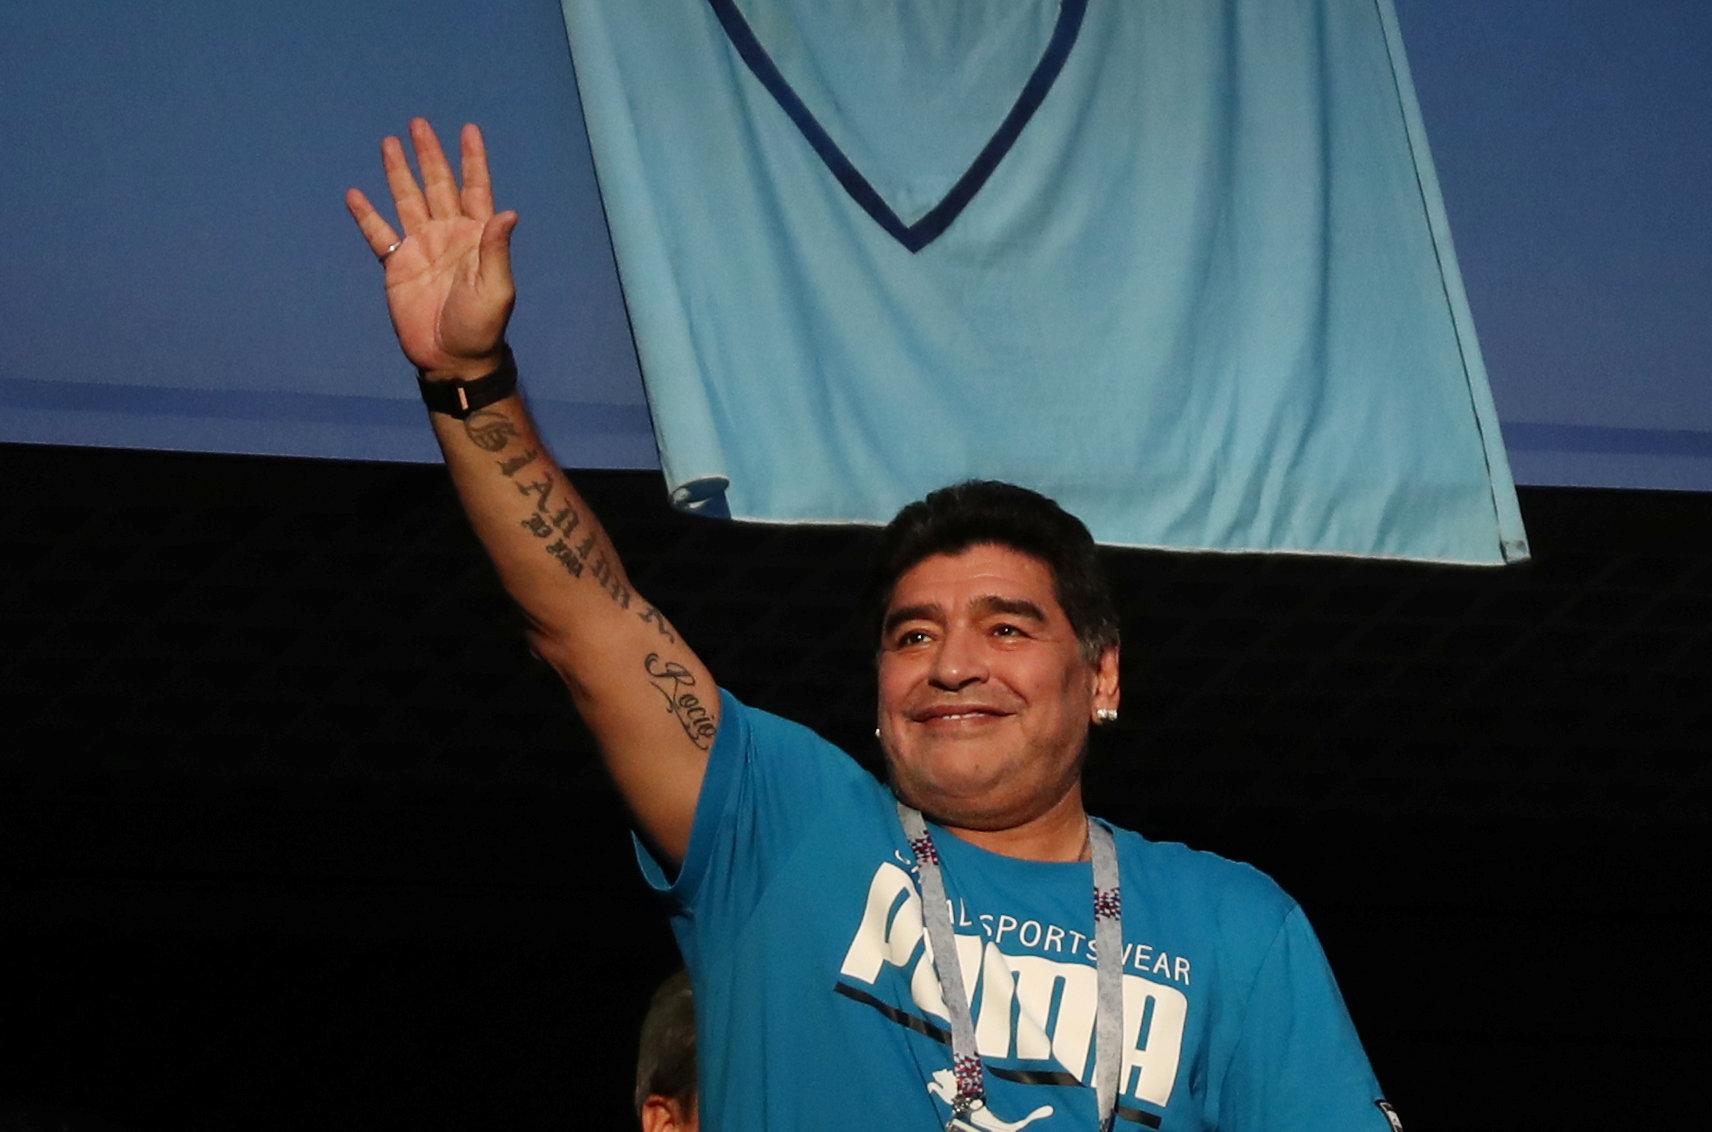 Football: Maradona 'fine' after health scare